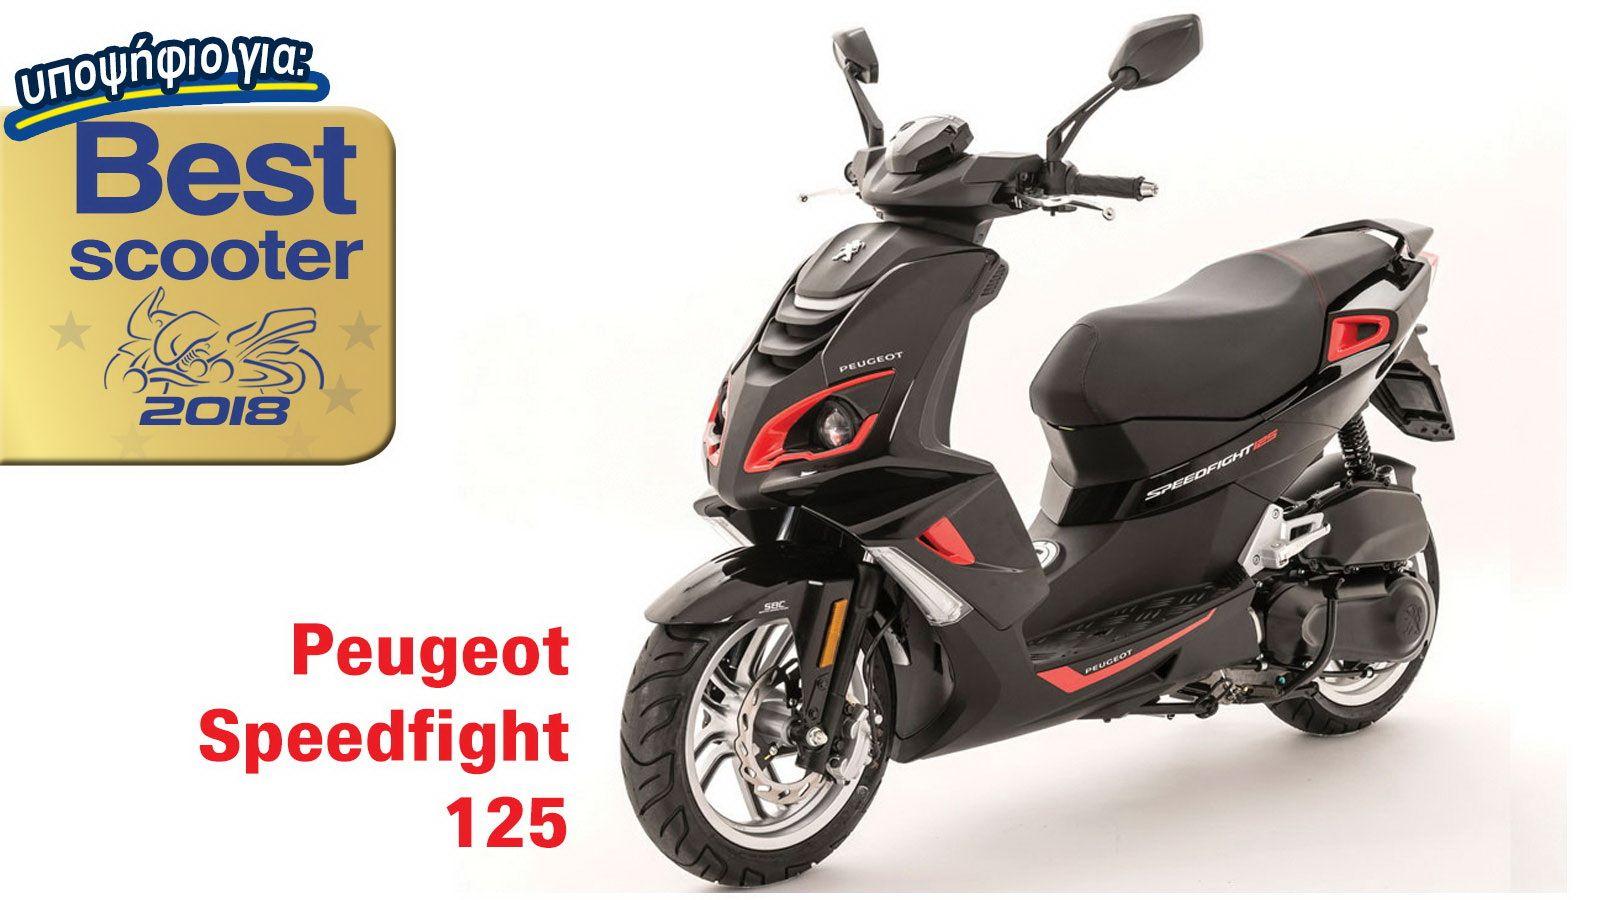 Peugeot Speedfight 125: Υποψήφιο για Best Scooter 2018 - peugeot